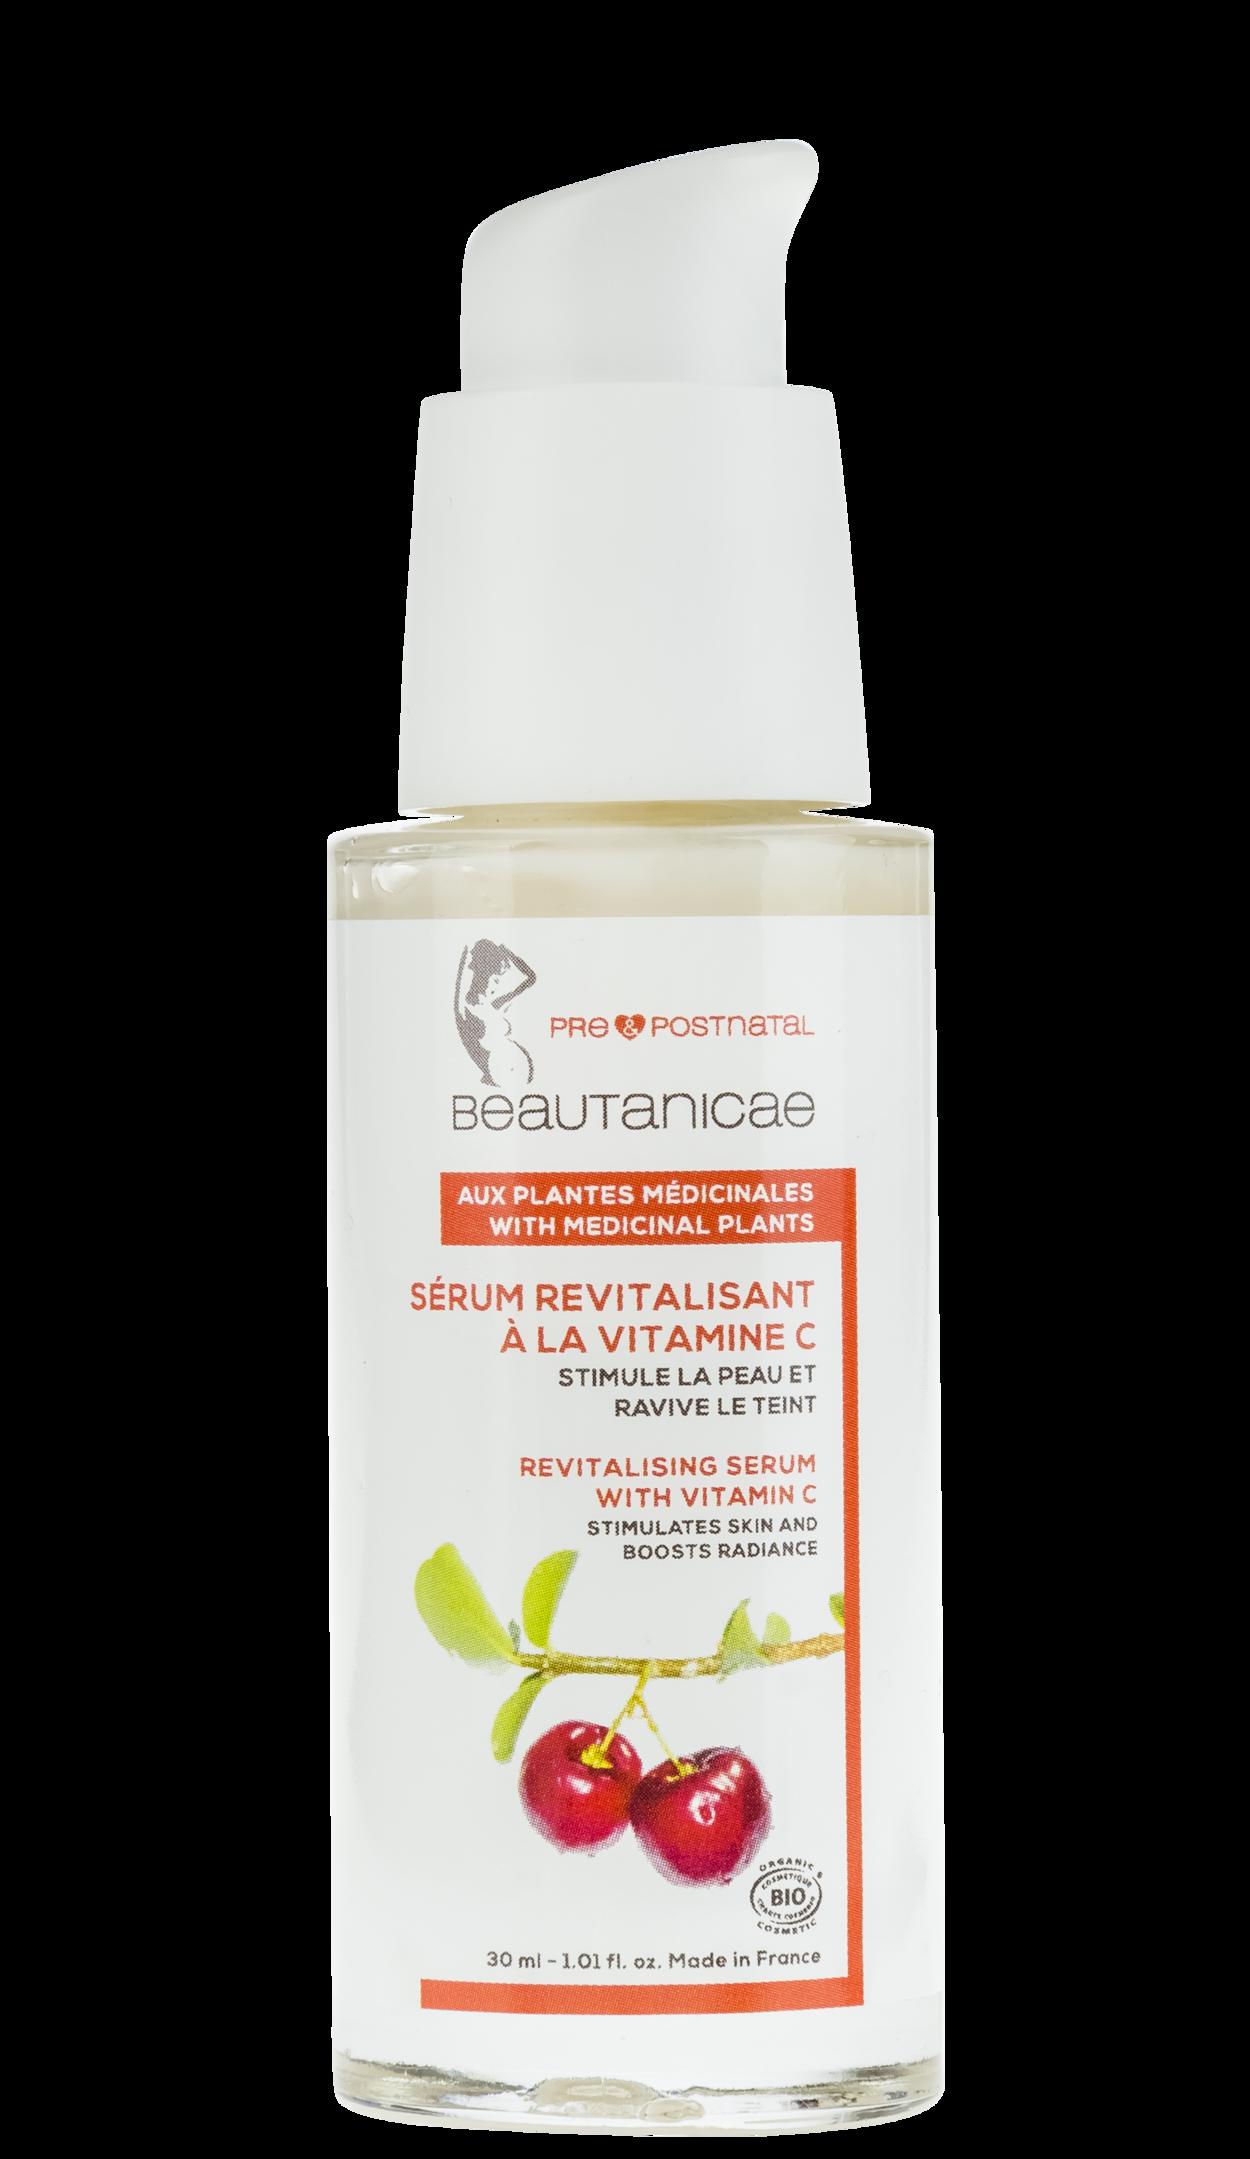 Revitalisant Vitamine Sérum C À La Beautanicae EHIWDe29Y